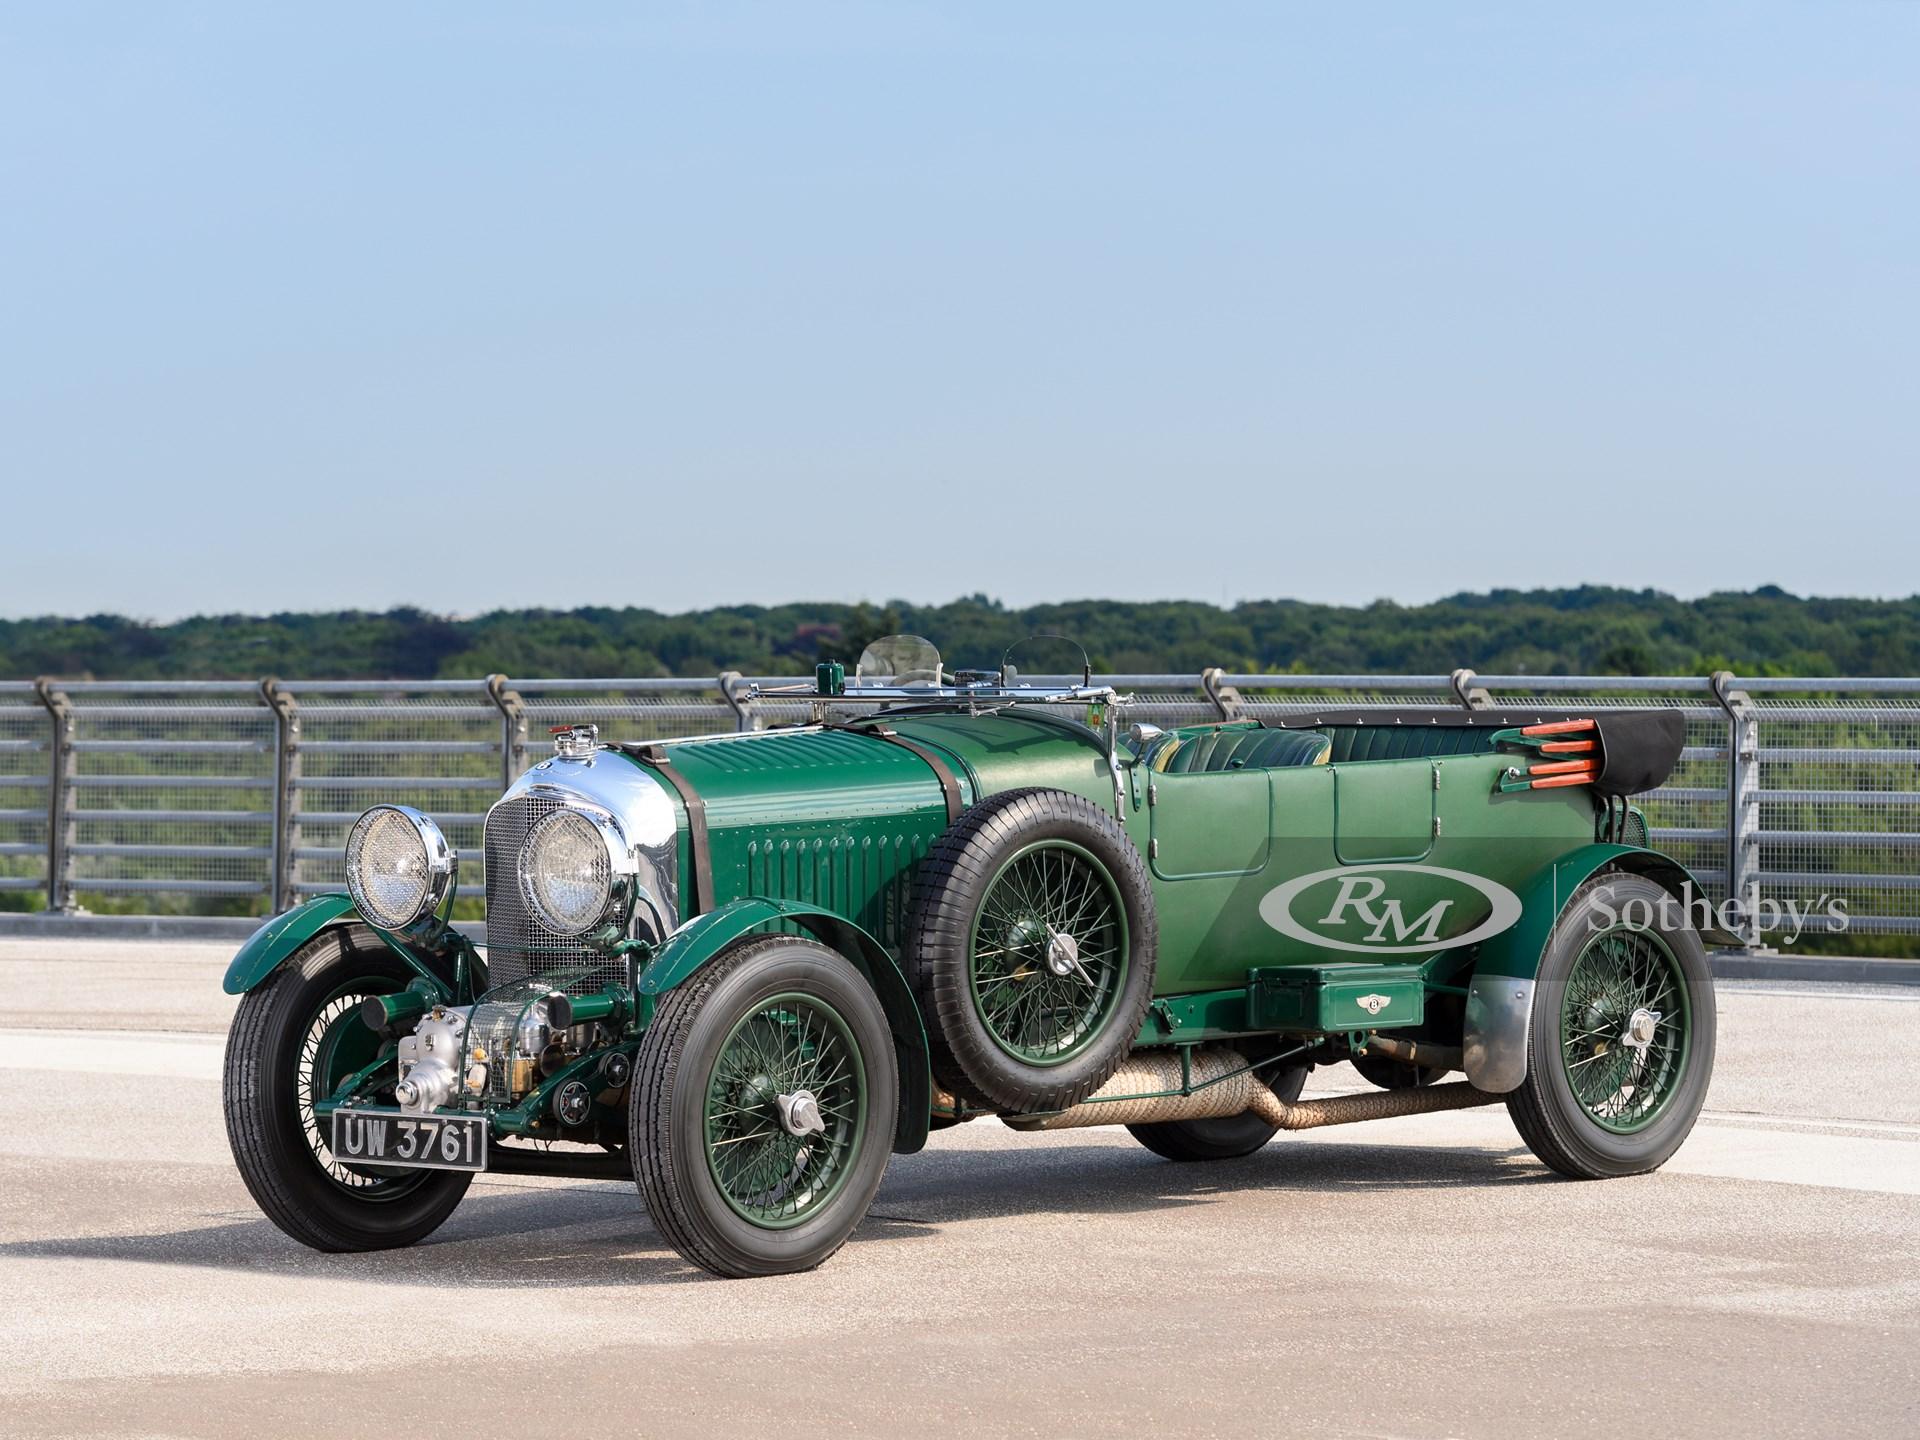 1930 Bentley 4½-Litre Supercharged Tourer (Tim Scott ©2021 Courtesy of RM Sotheby's)